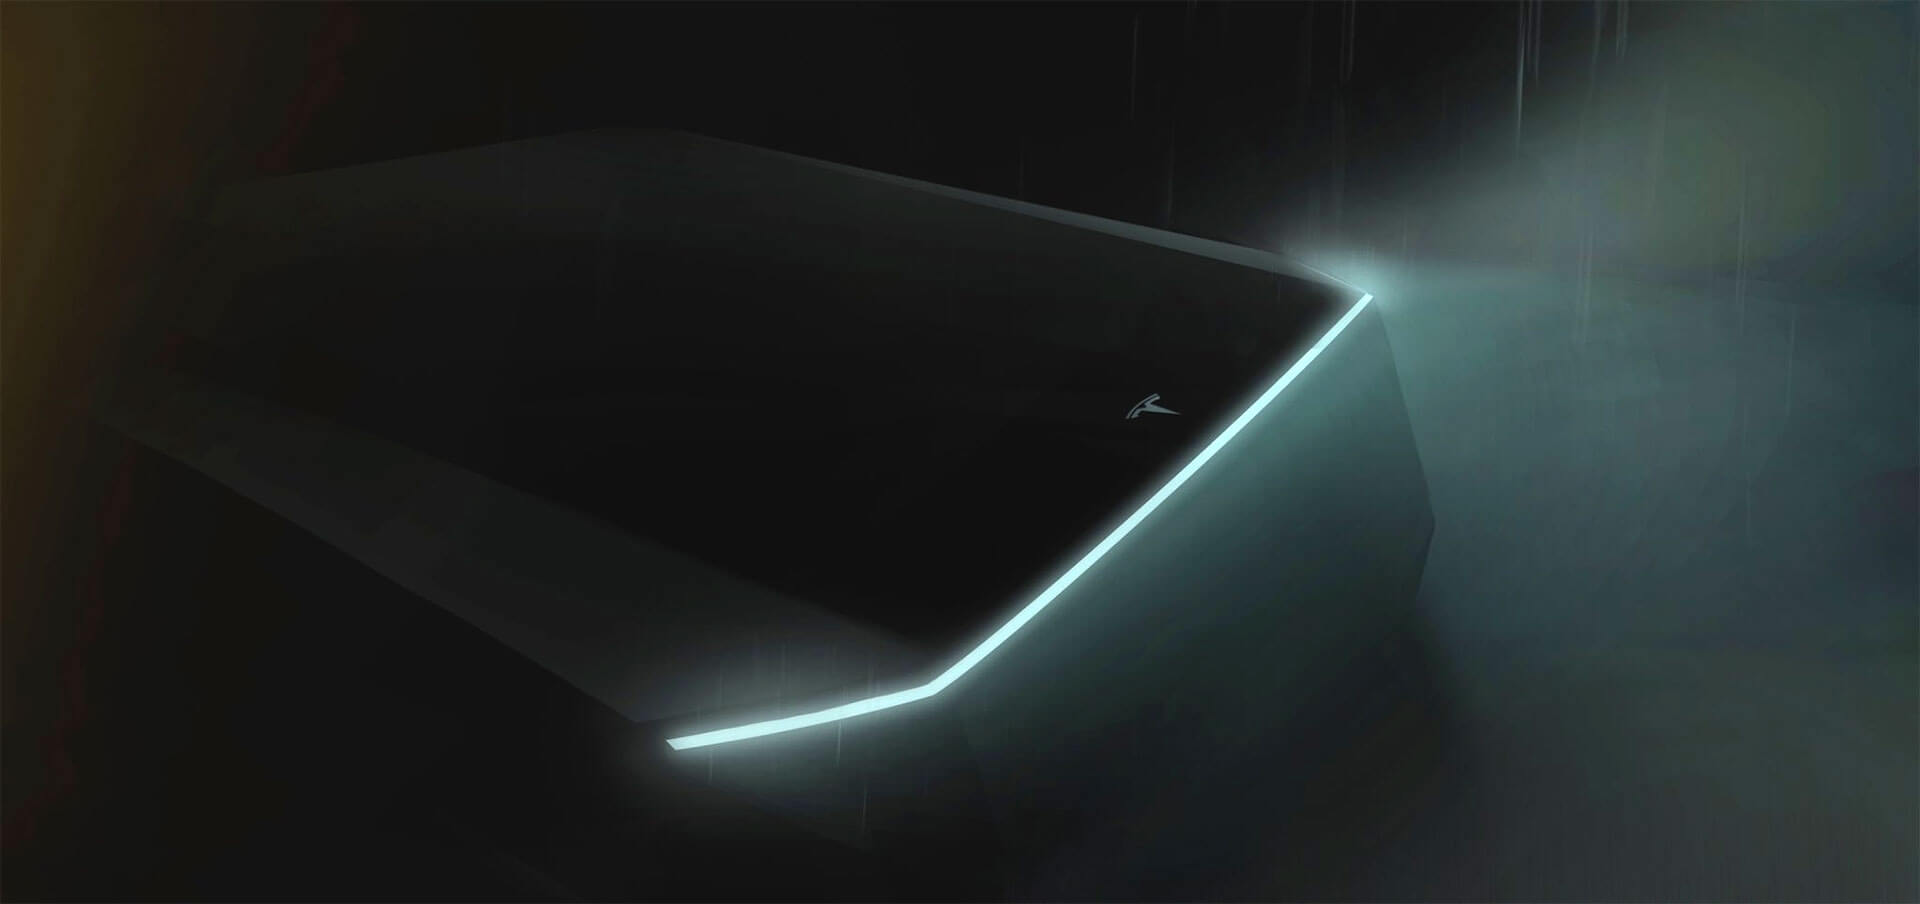 Фото-тизер электрического пикапа Tesla